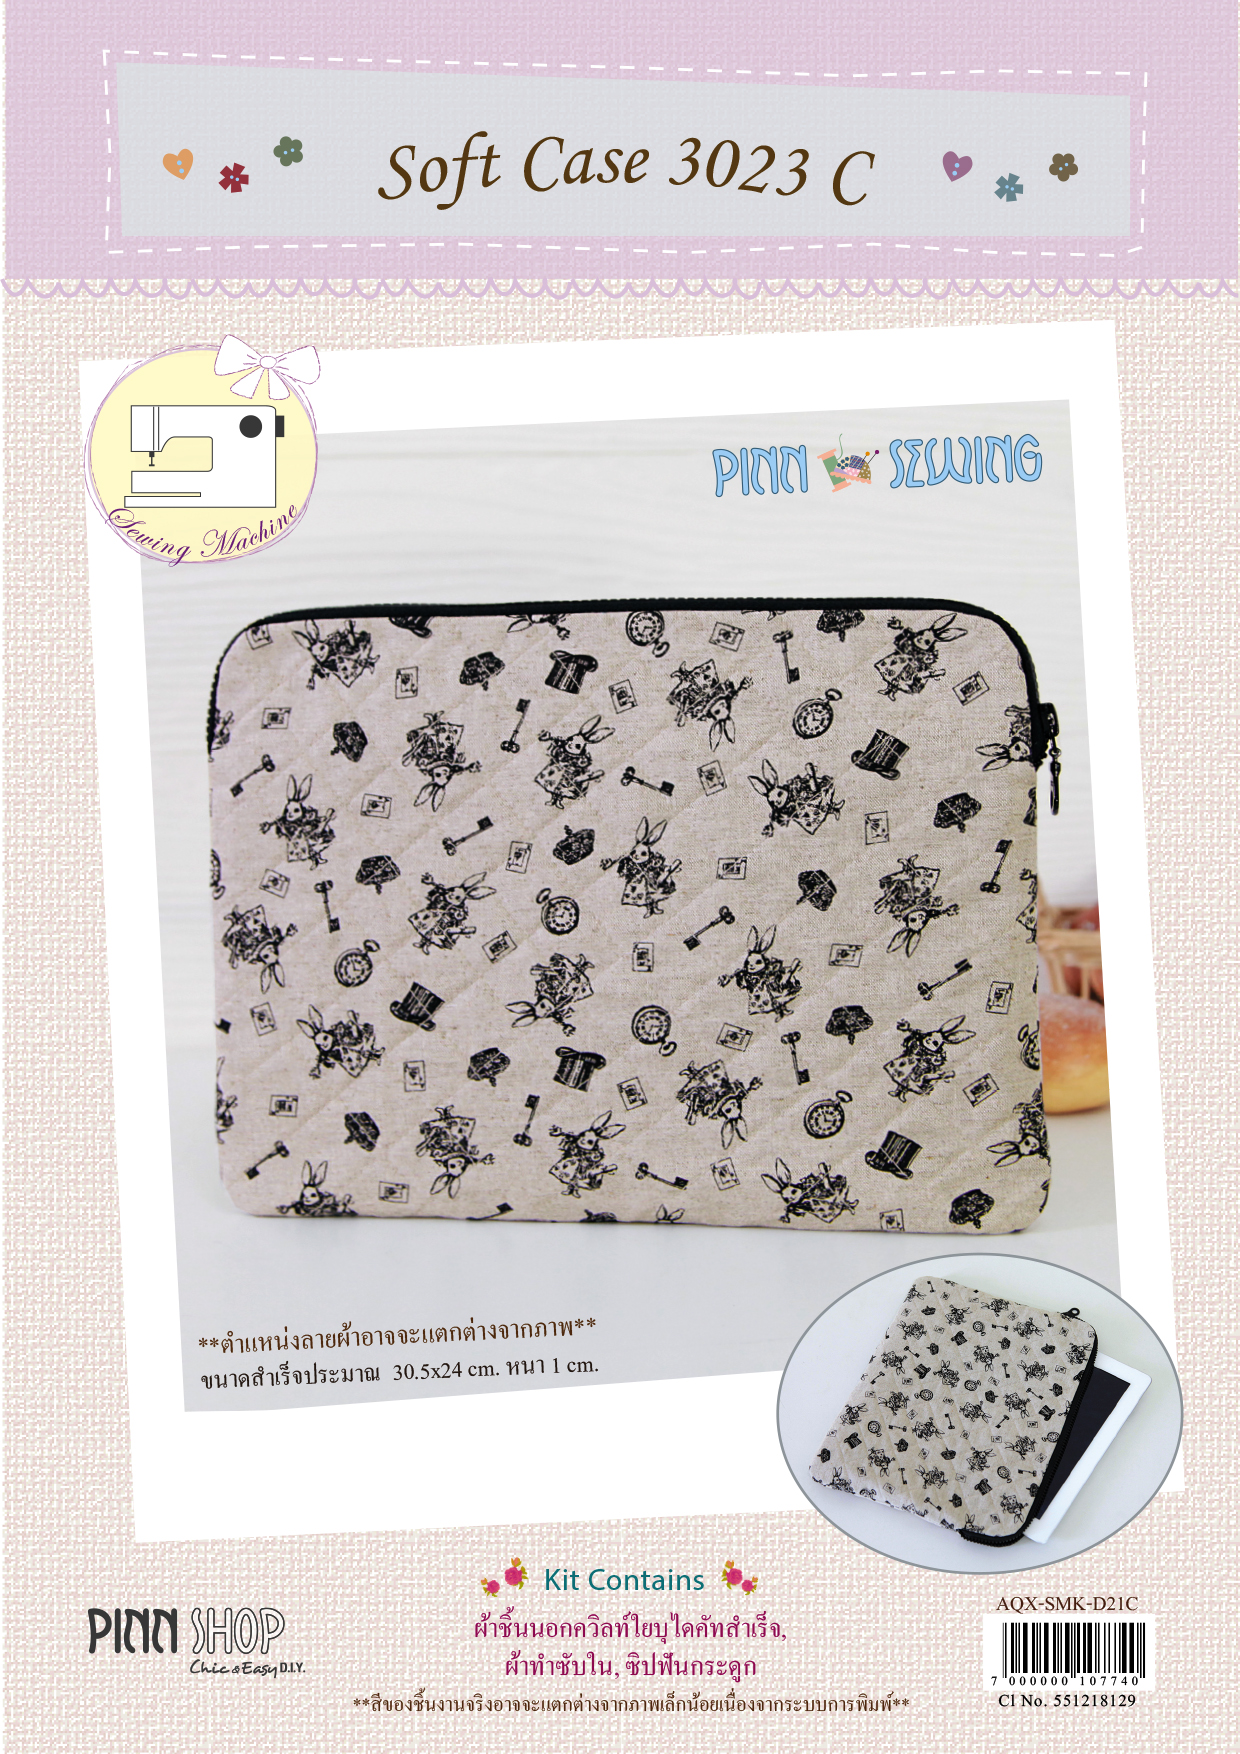 Soft Case 3023 C (กระต่าย)